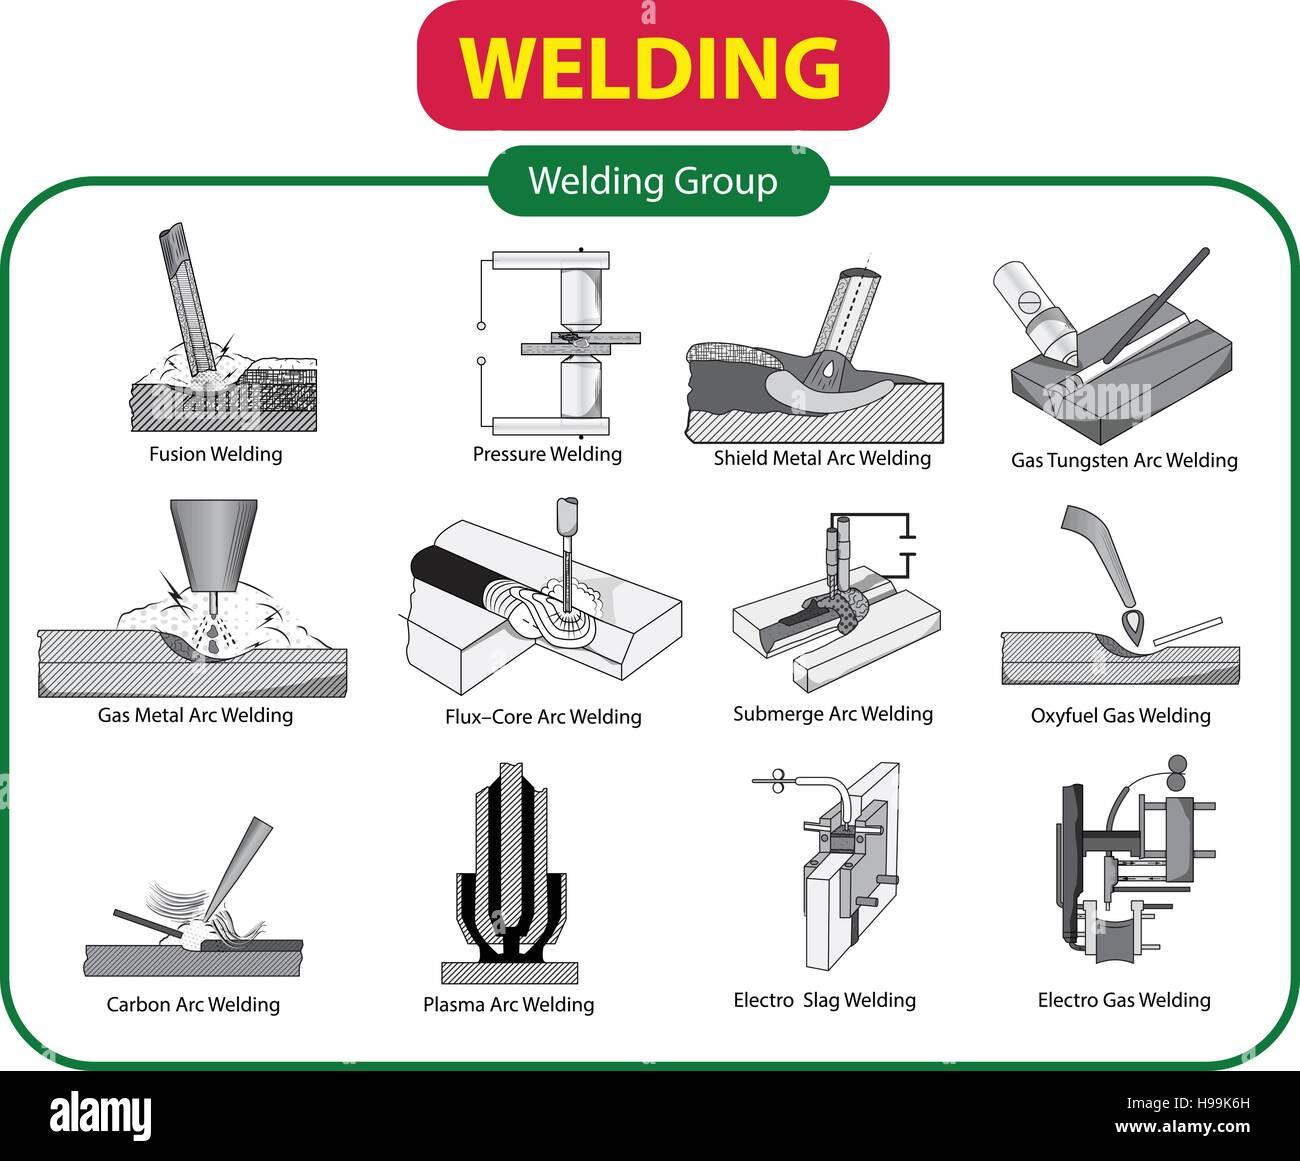 Torch Stock Vector Images Alamy Electroslag Welding Diagram Illustration Of Type